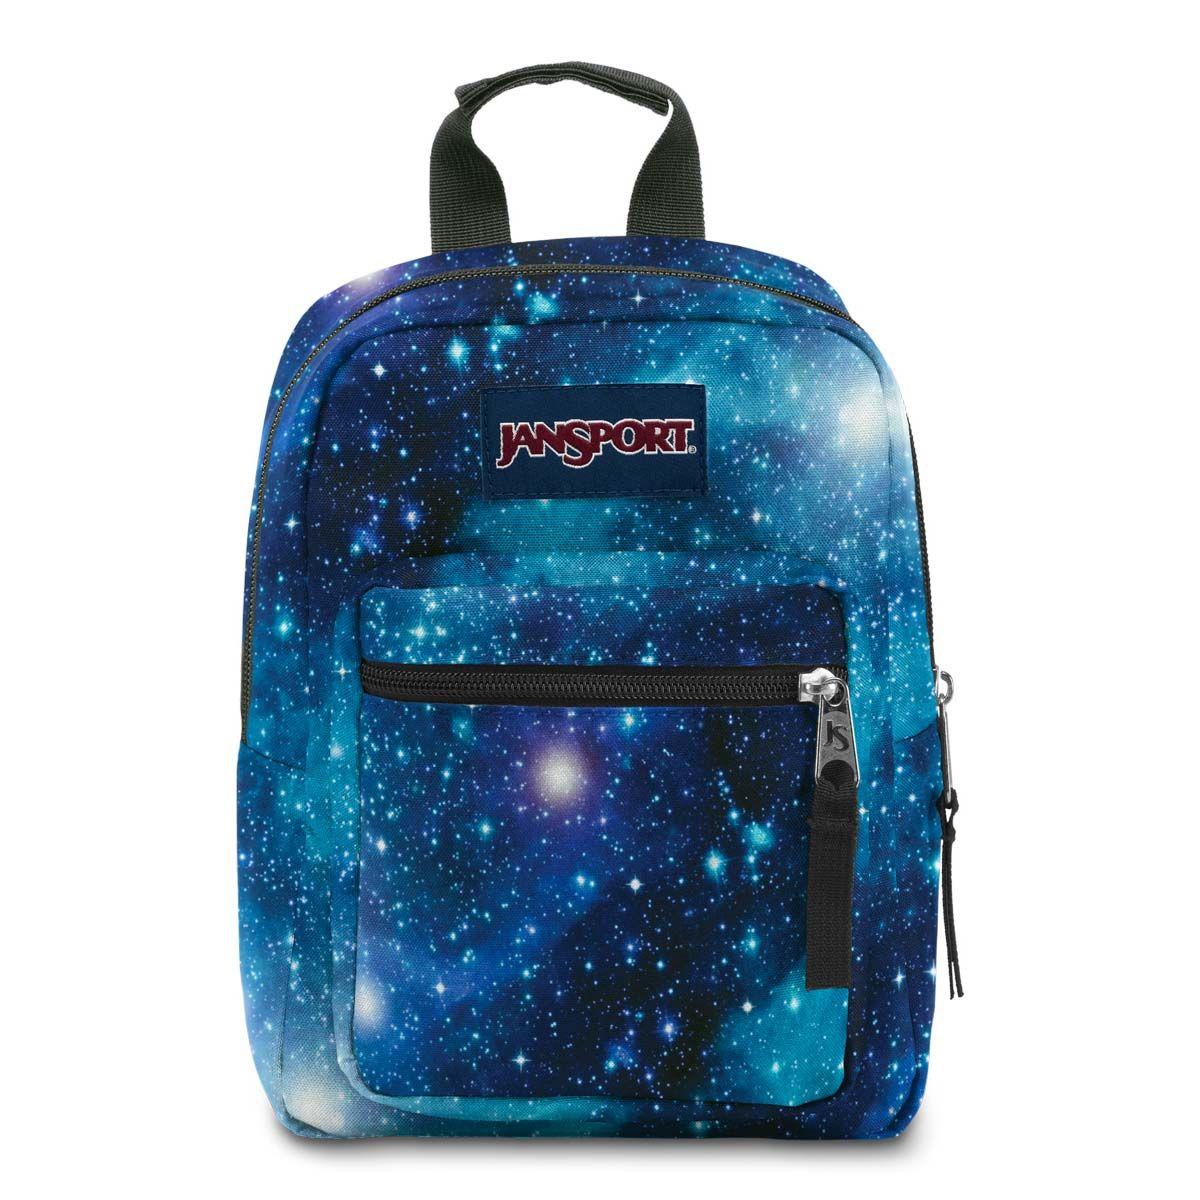 JanSport Big Break Lunch Bag in Galaxy